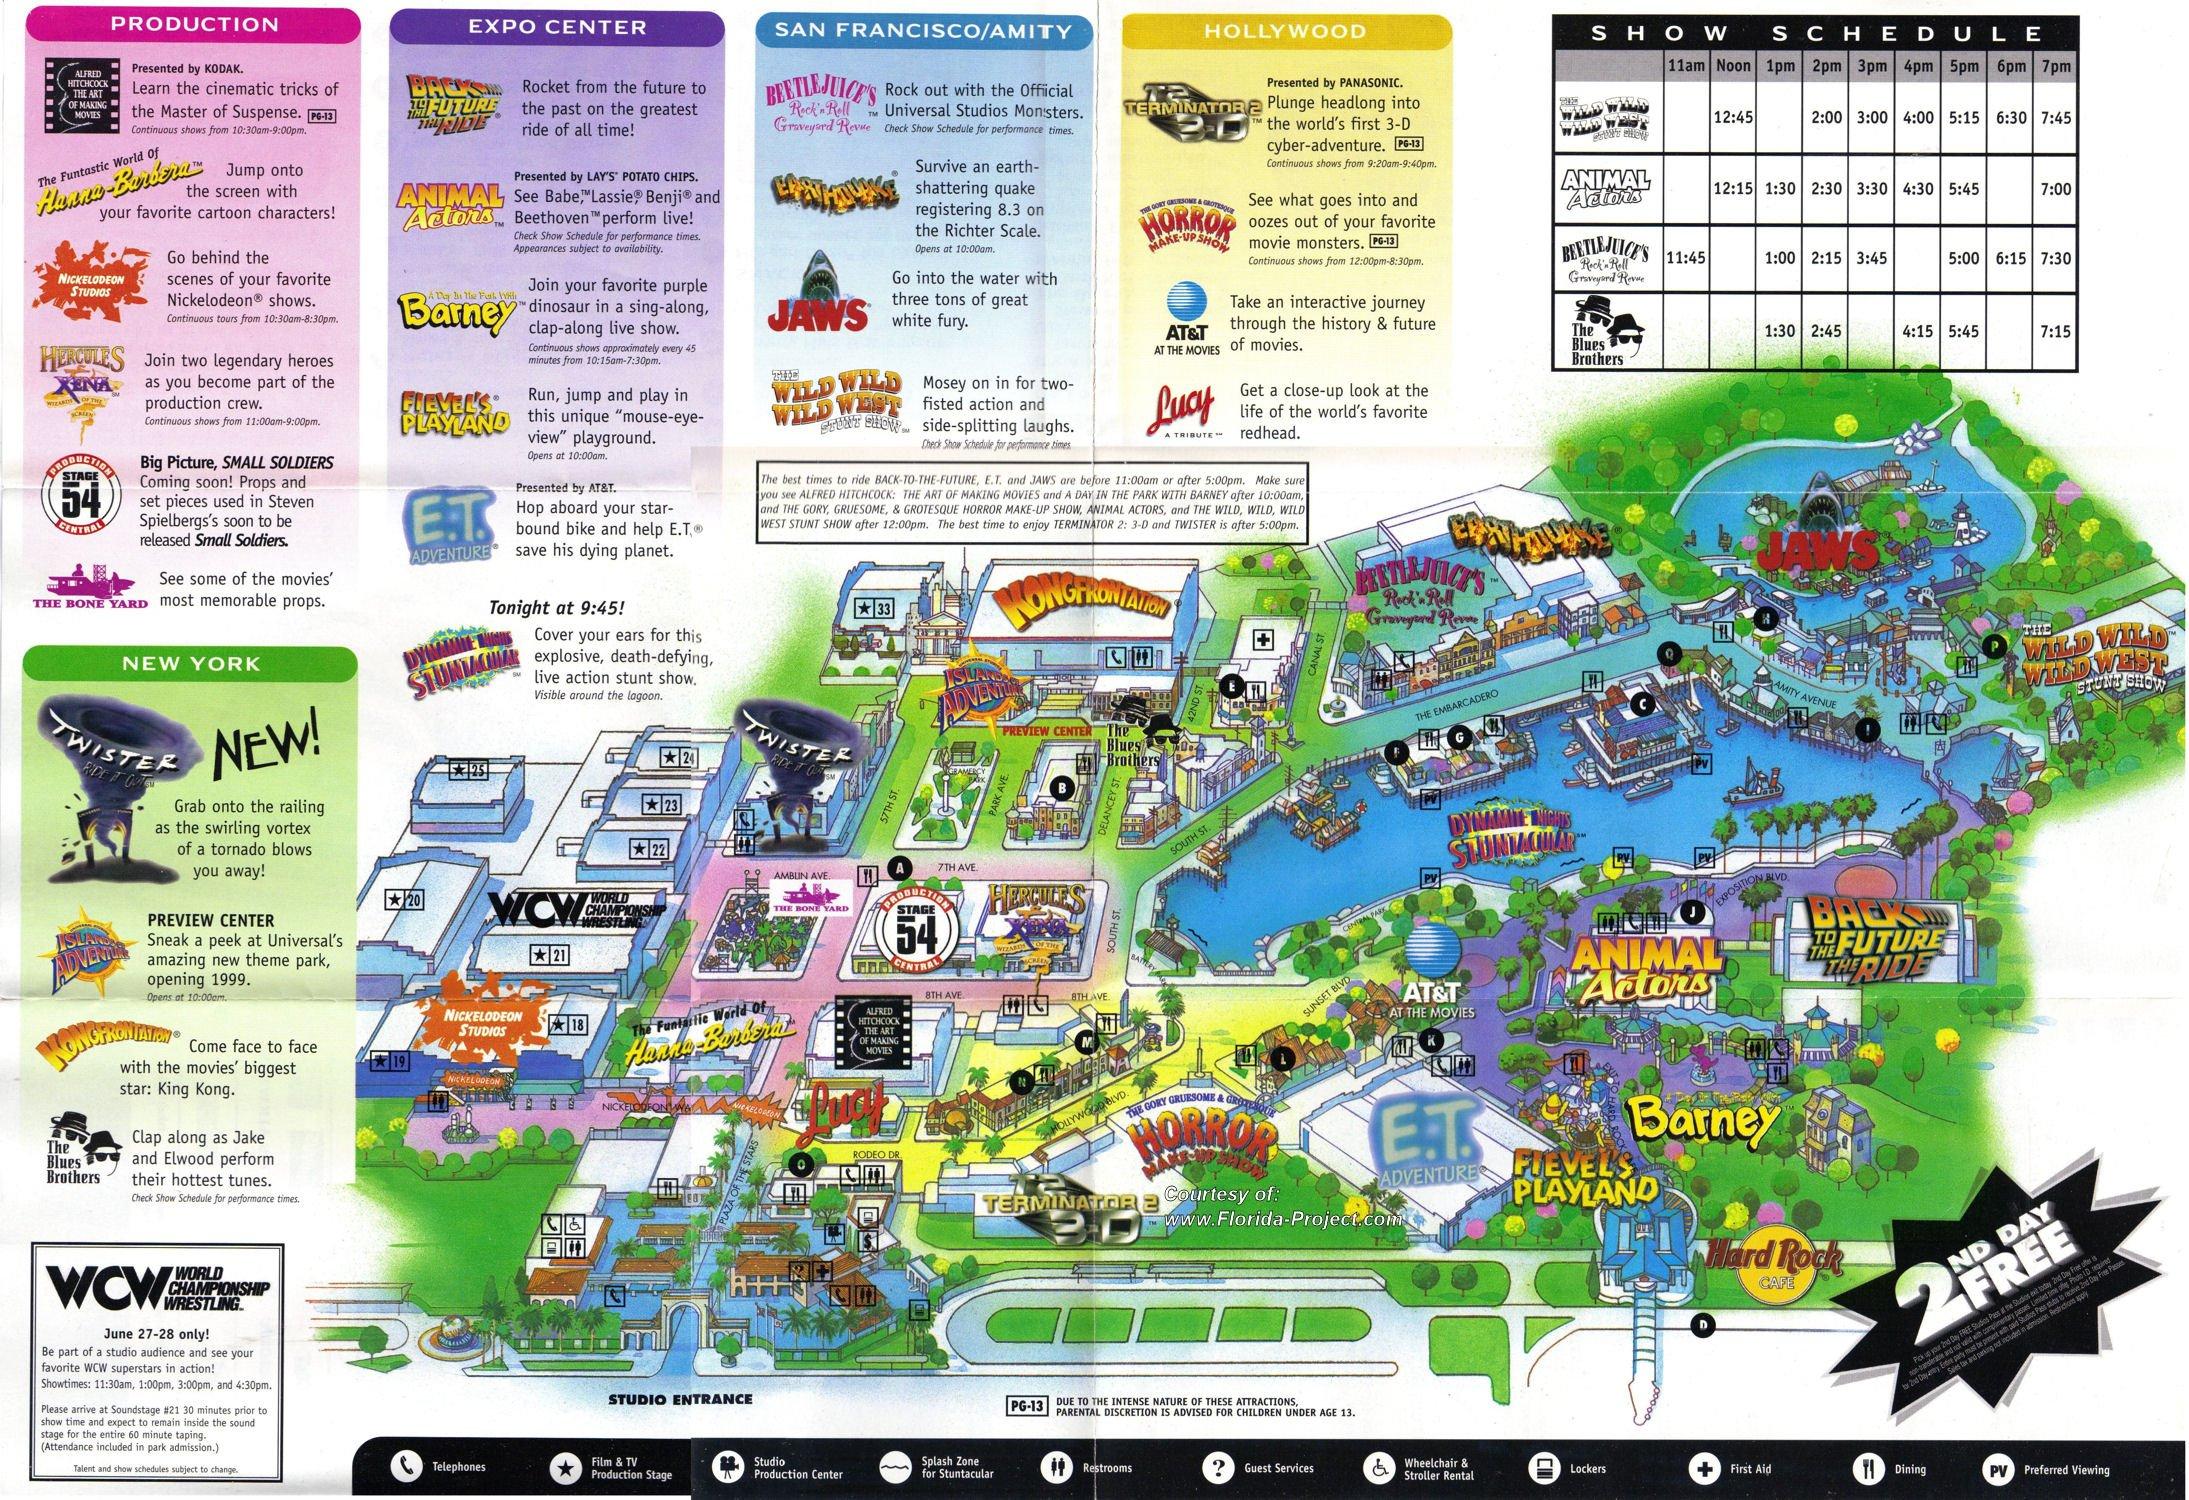 Universal Studios Florida Map 2018 From Ambergontrail 4 - Ameliabd - Universal Parks Florida Map